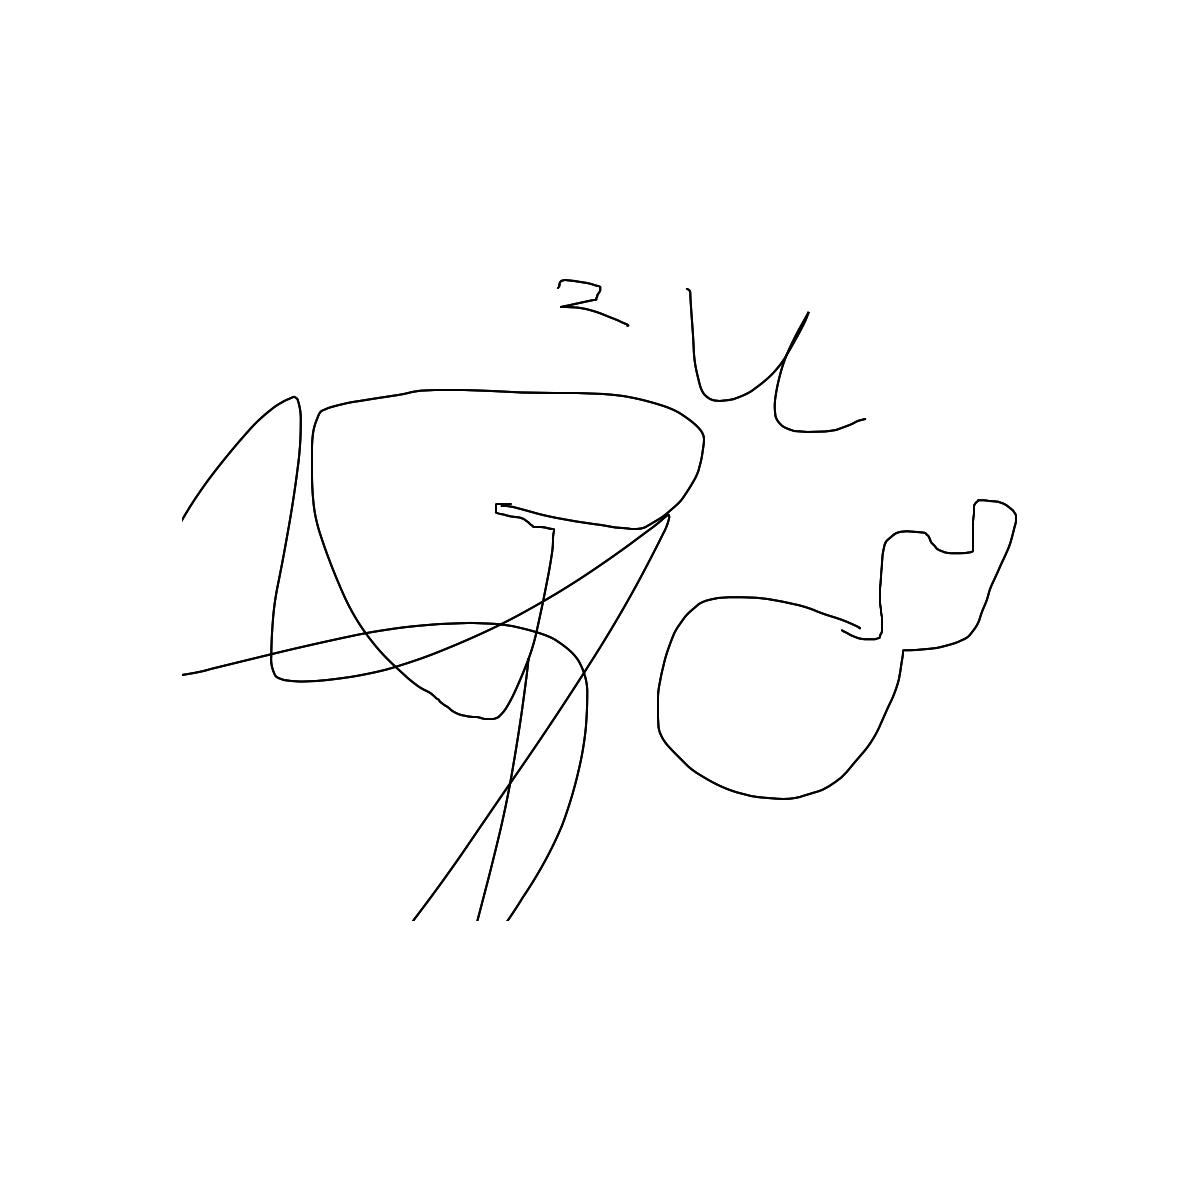 BAAAM drawing#2885 lat:29.7083873748779300lng: -98.1374740600586000